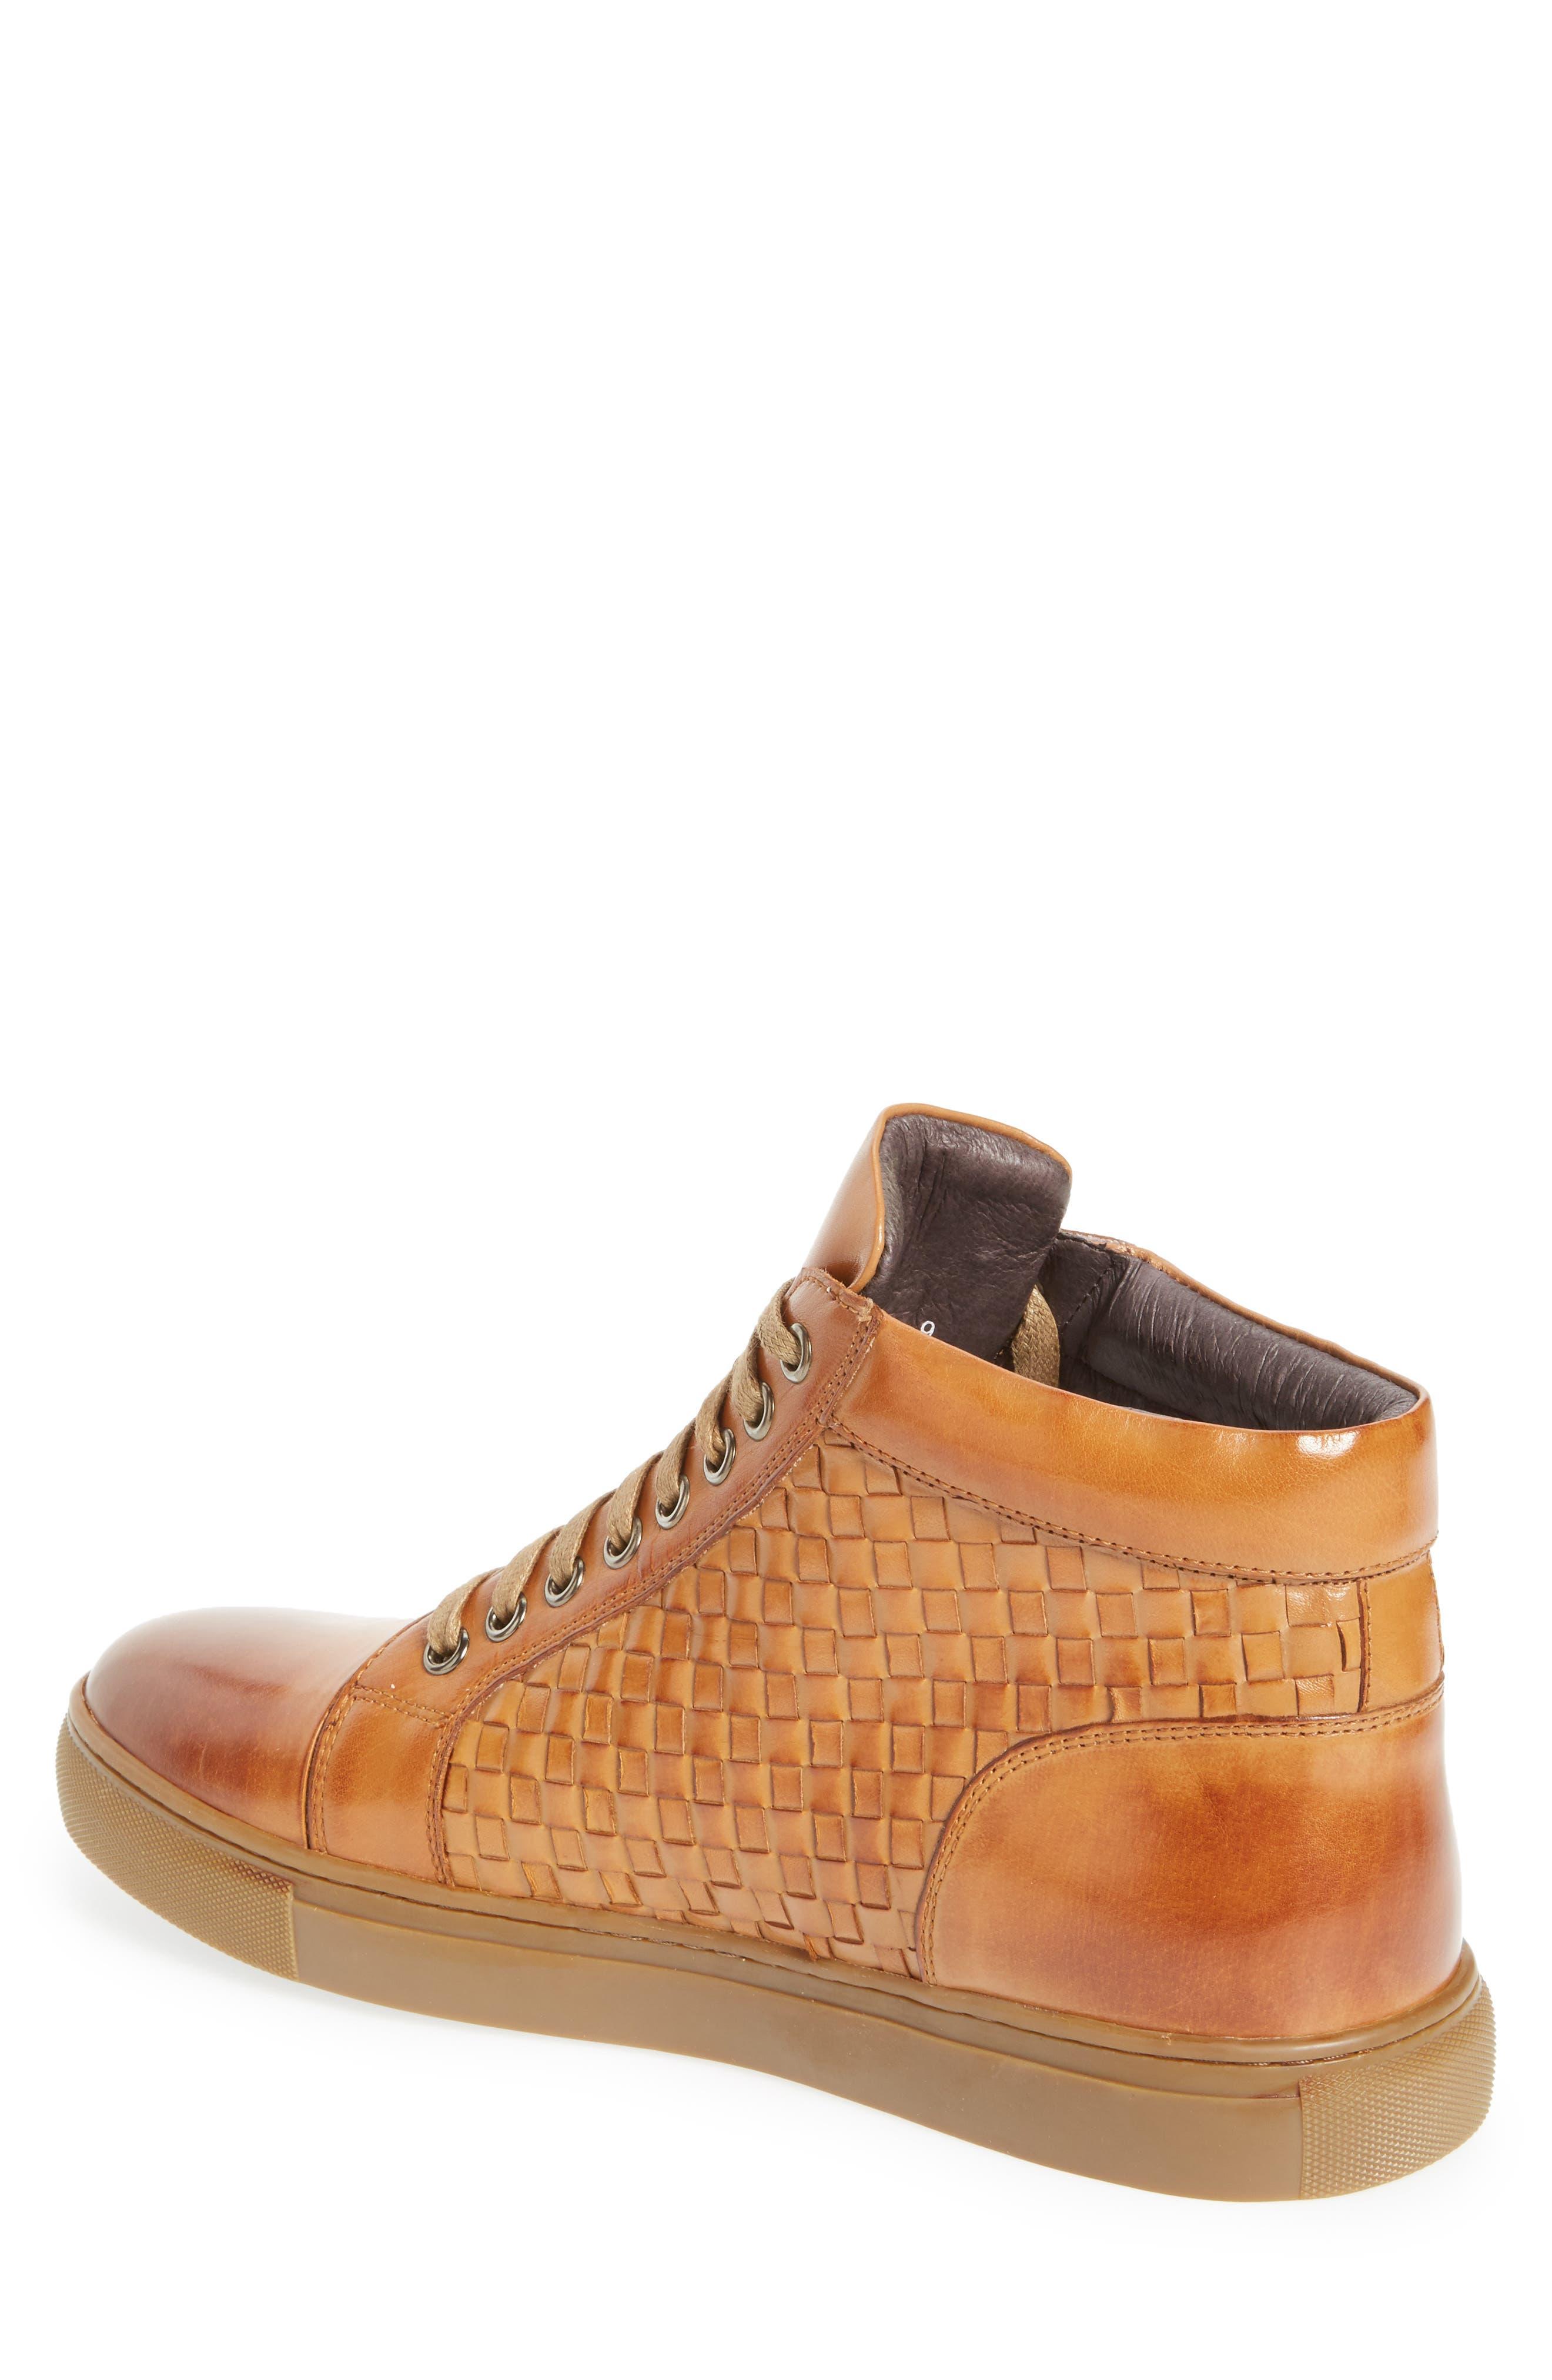 Soul High Top Sneaker,                             Alternate thumbnail 9, color,